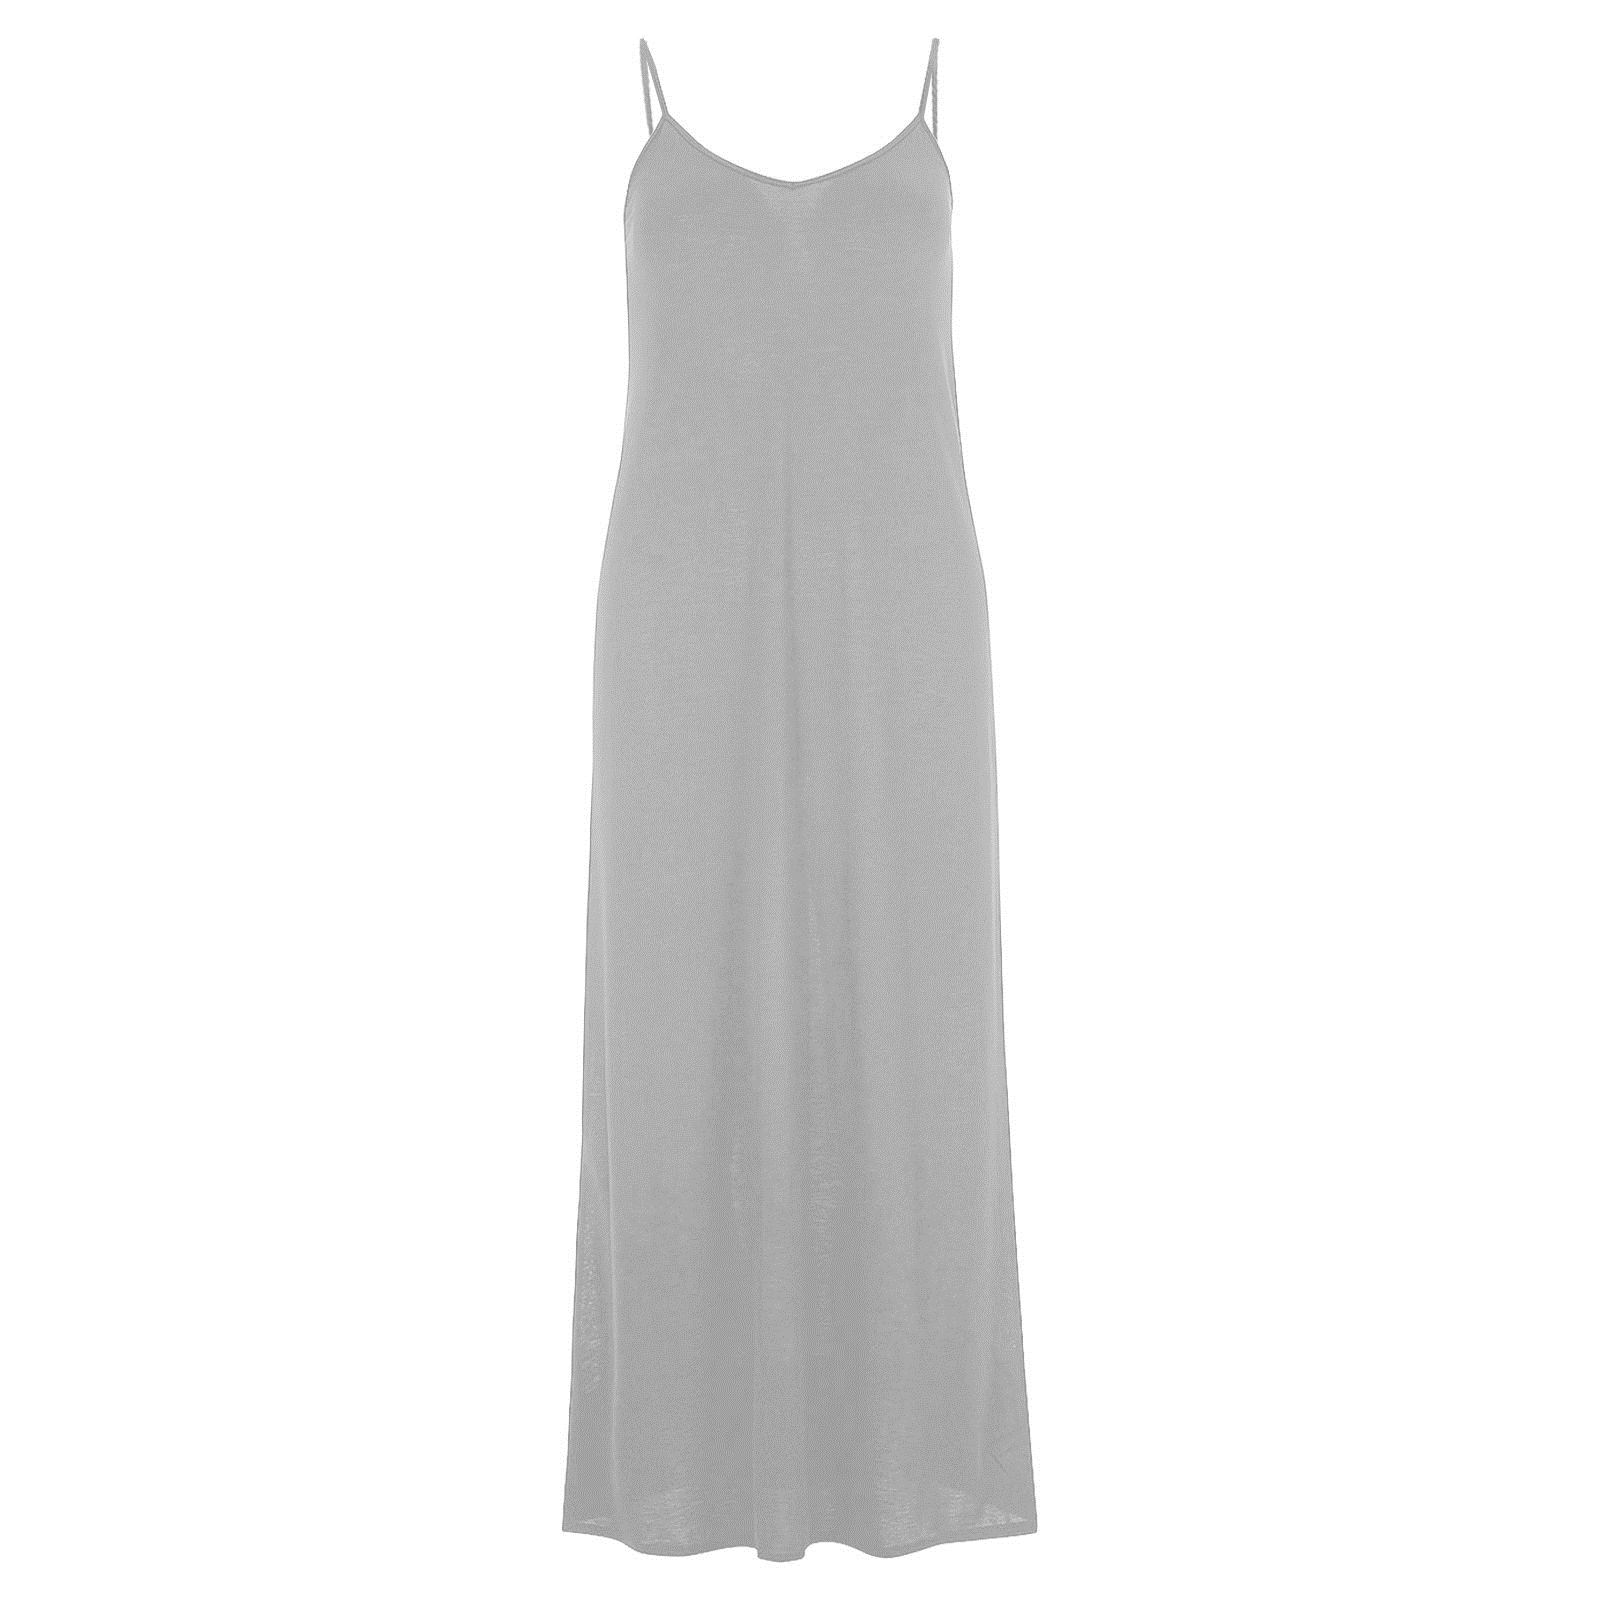 e57c0612c31 New Ladies Womens Cami Sleeveless Spaghetti Strap Long Maxi Dress ...